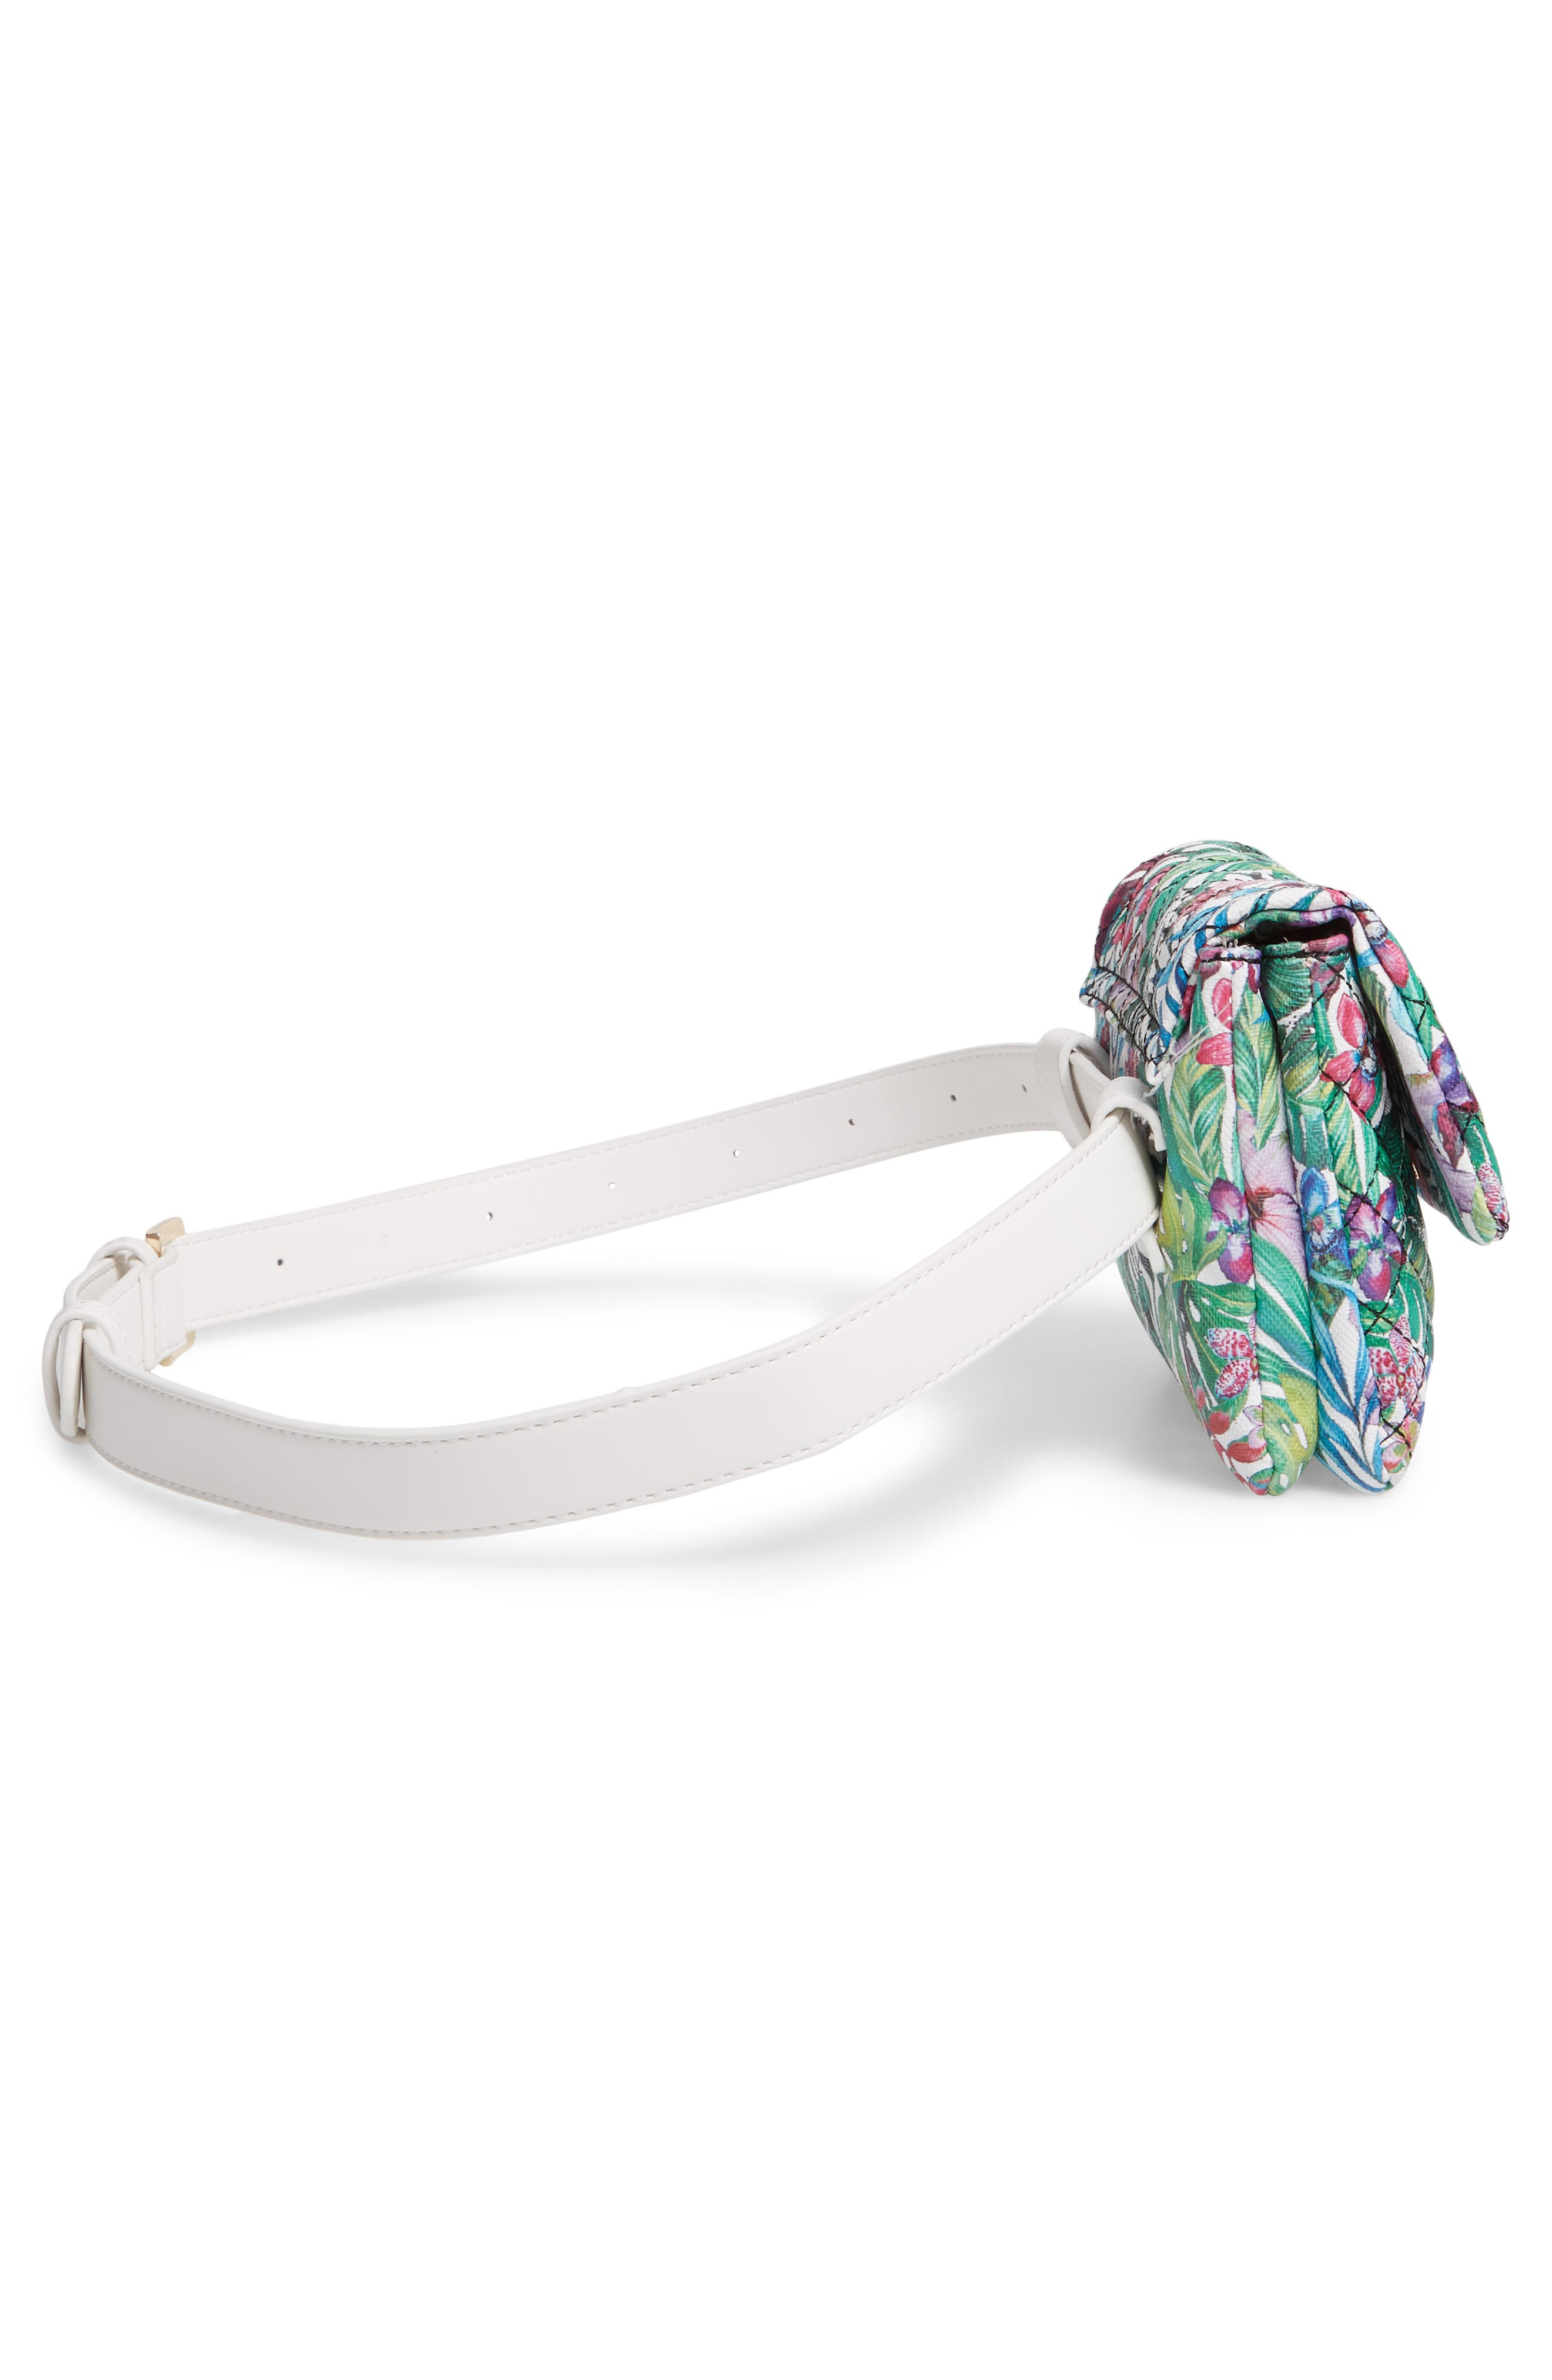 MALI + LILI,                             Quilted Vegan Leather Belt Bag,                             Alternate thumbnail 7, color,                             WHITE FLORAL